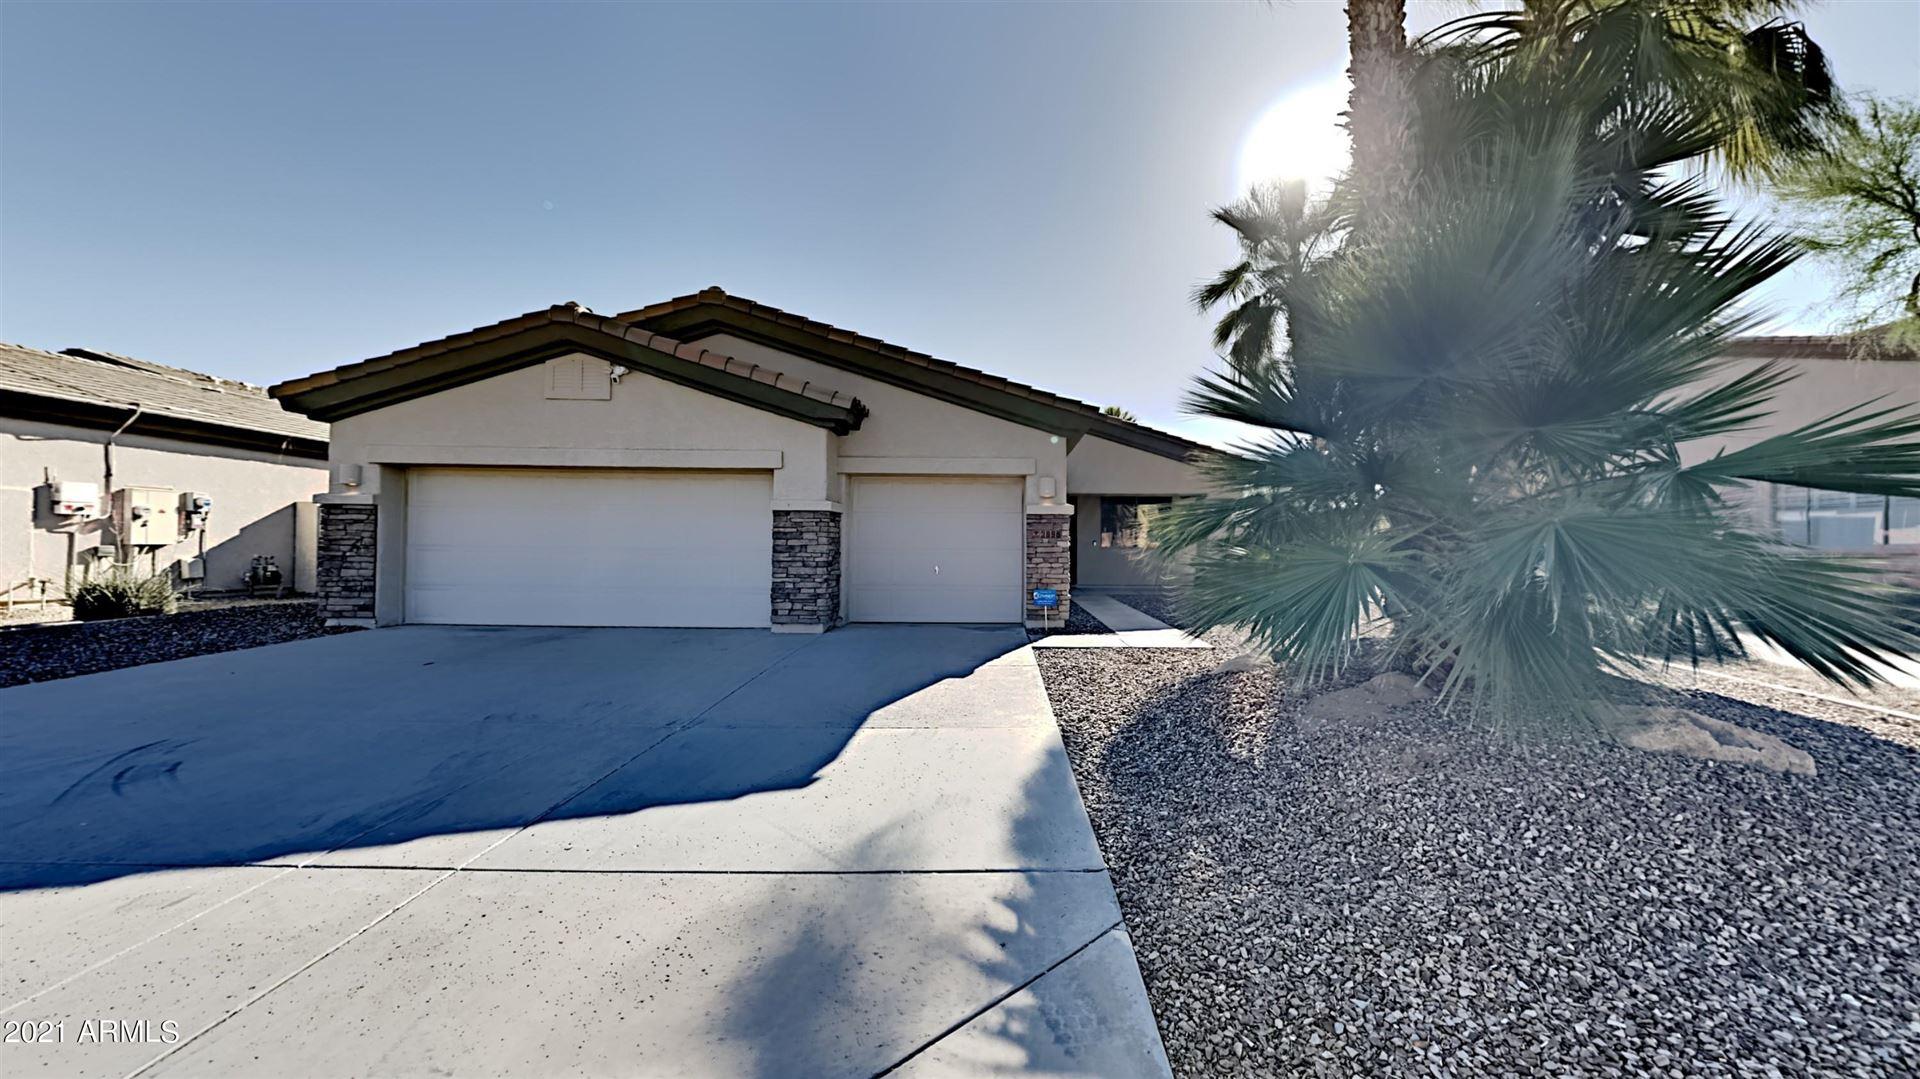 2898 N 141ST Avenue, Goodyear, AZ 85395 - MLS#: 6234430